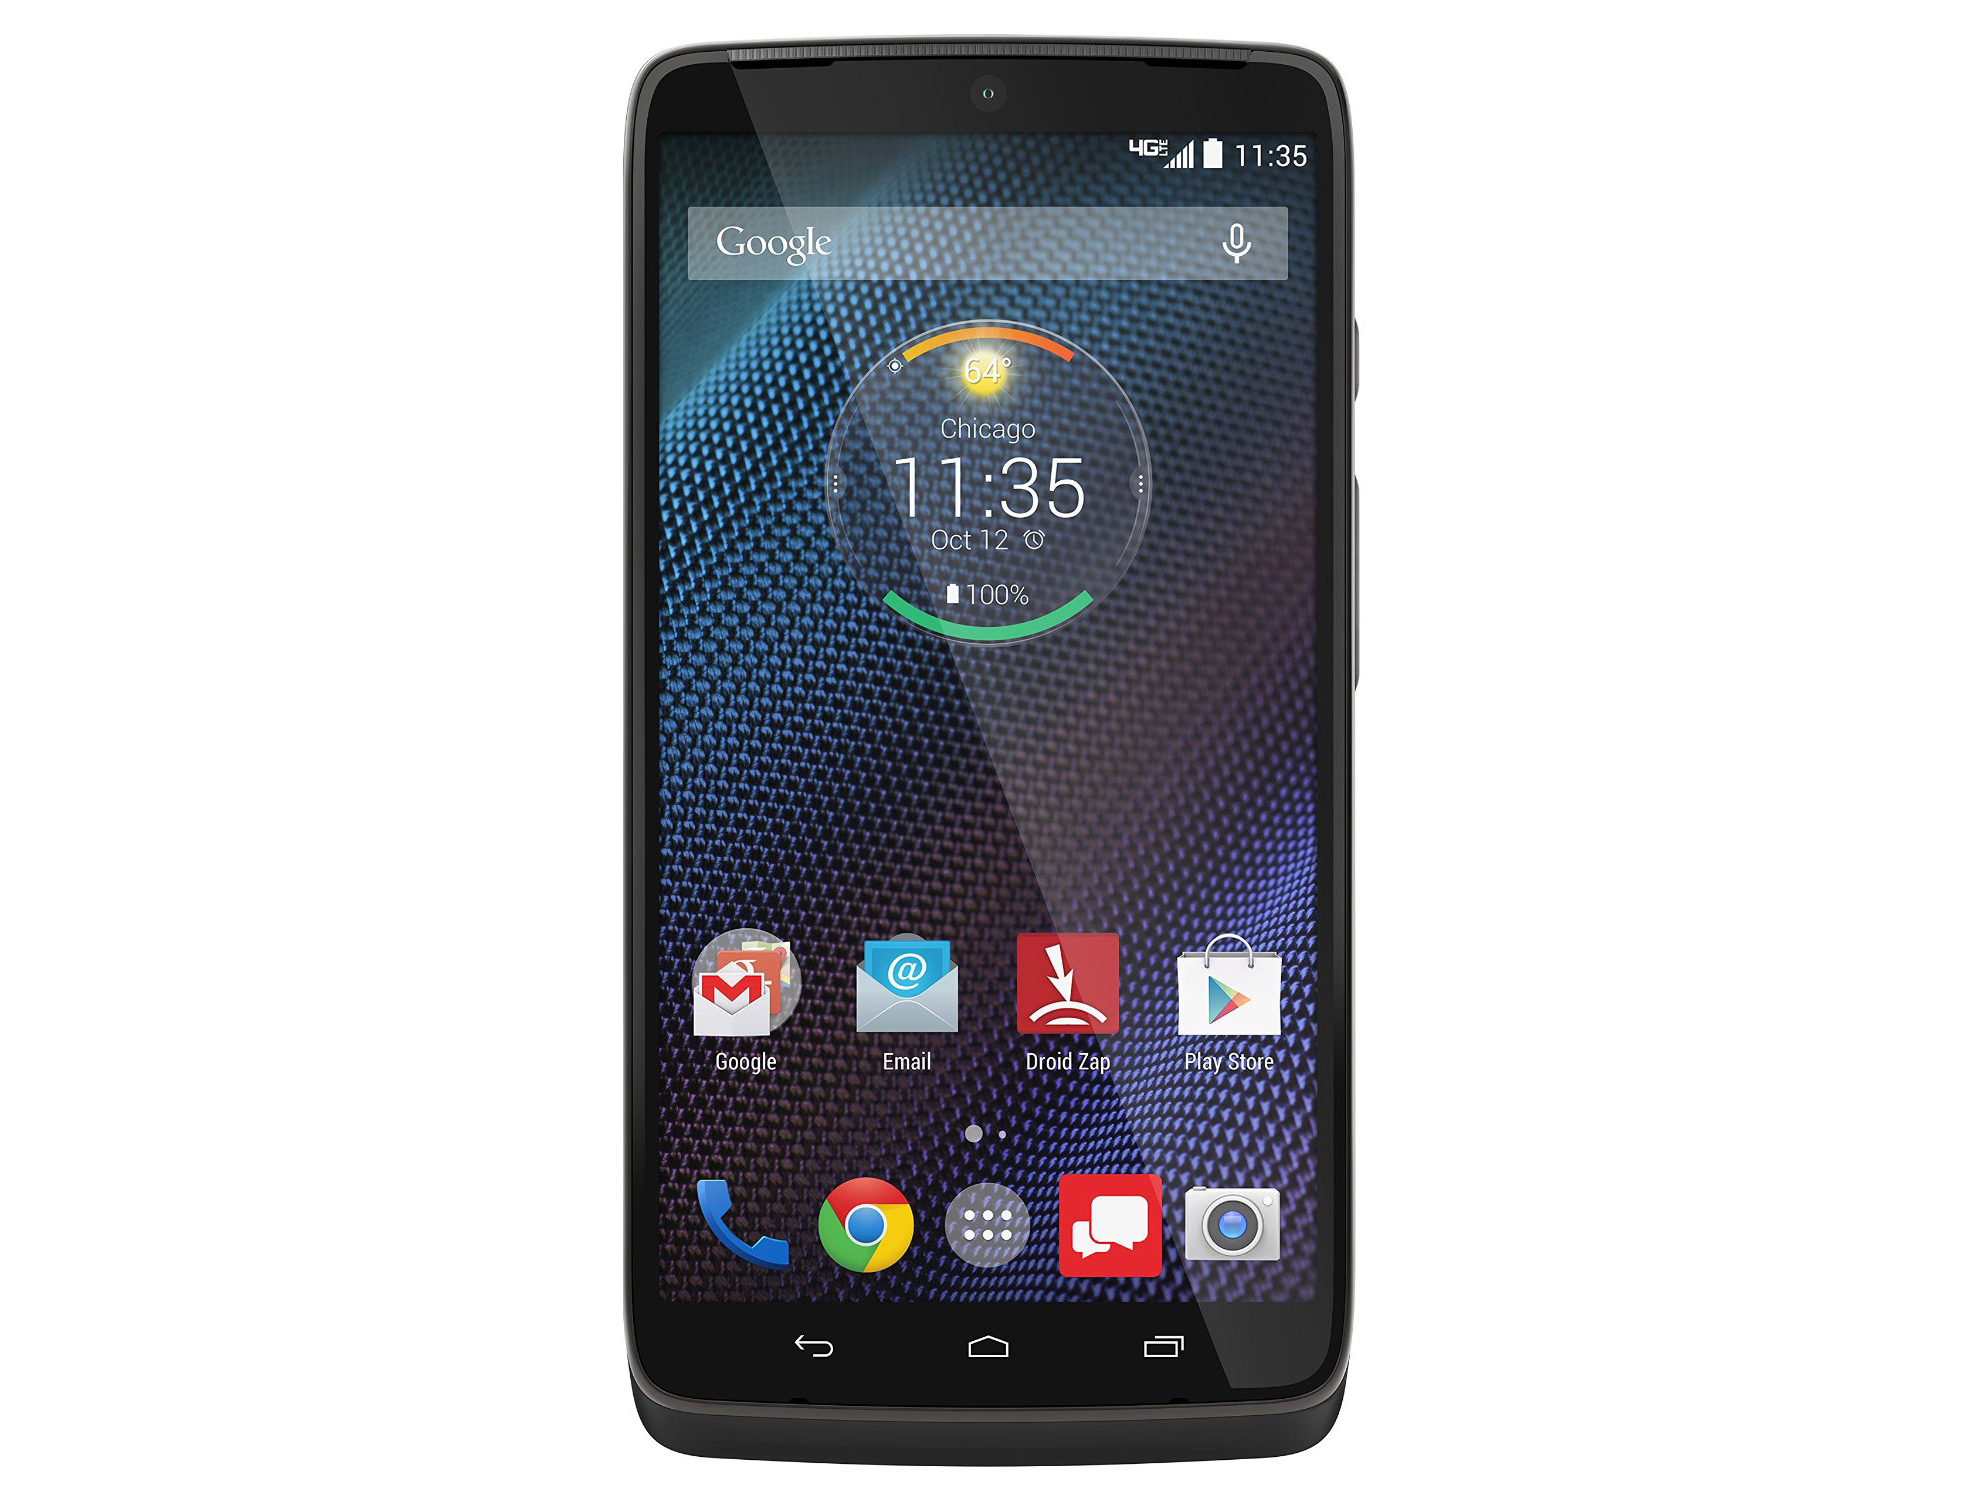 Motorola DROID Turbo, best smartphones, graduation gifts, graduation 2015